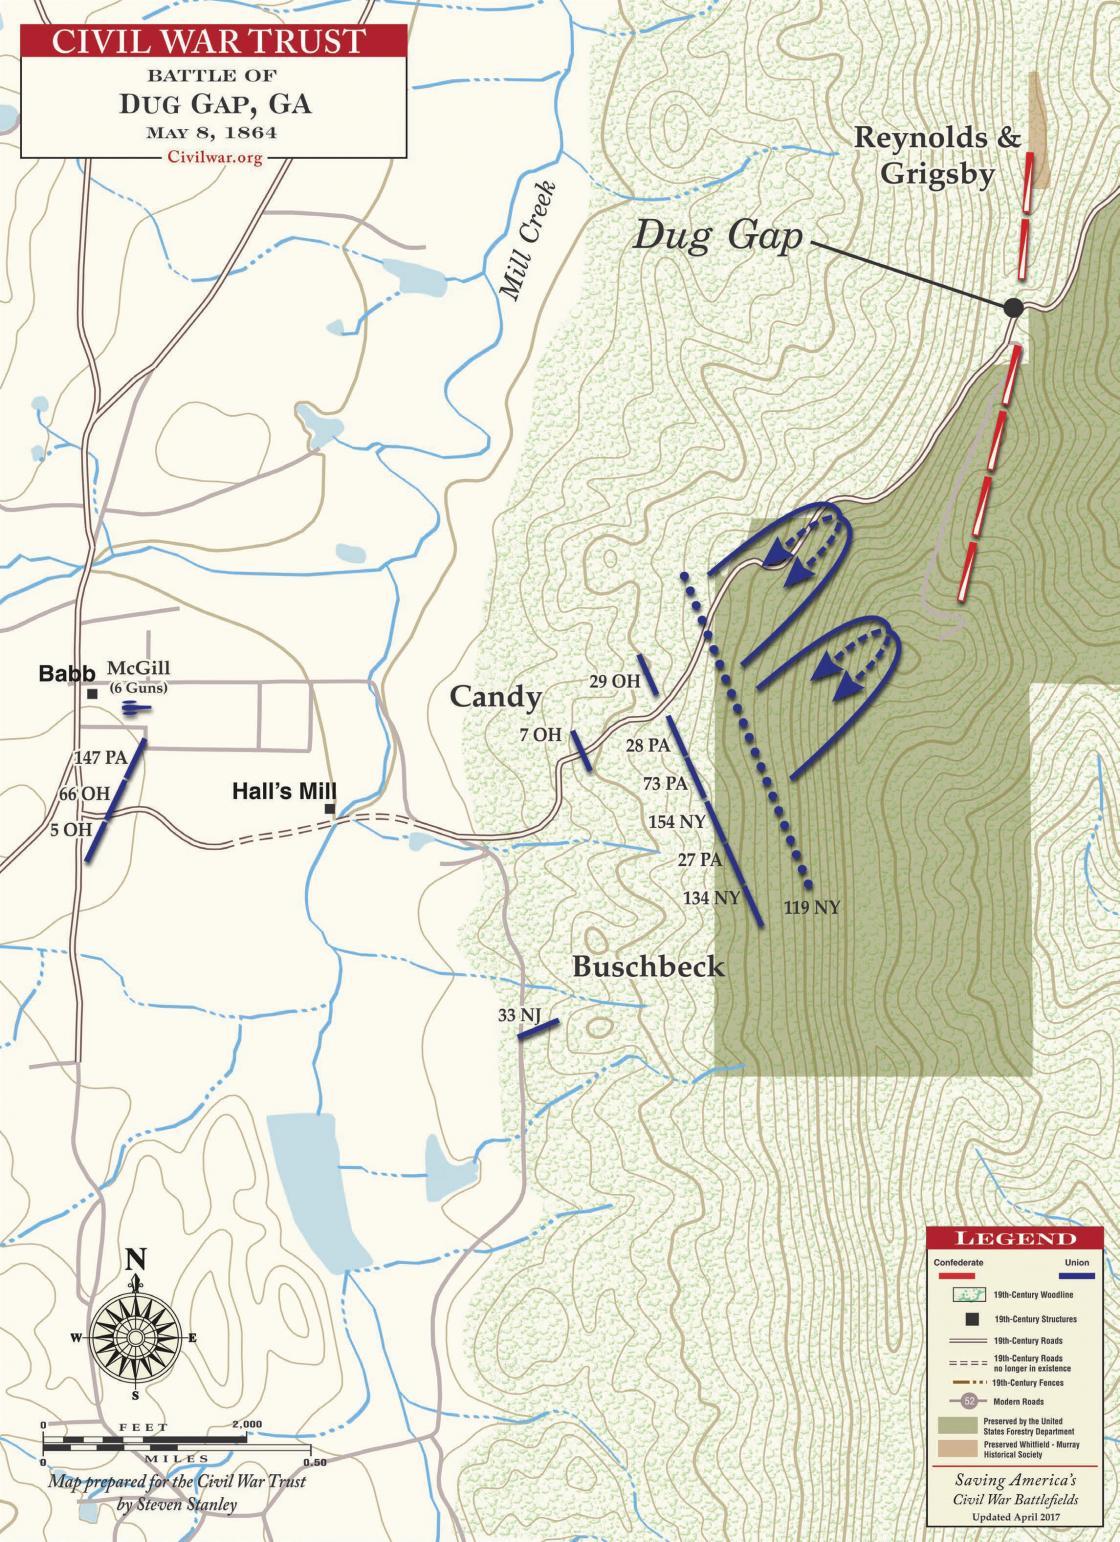 Battle of Dug Gap - May 8, 1864